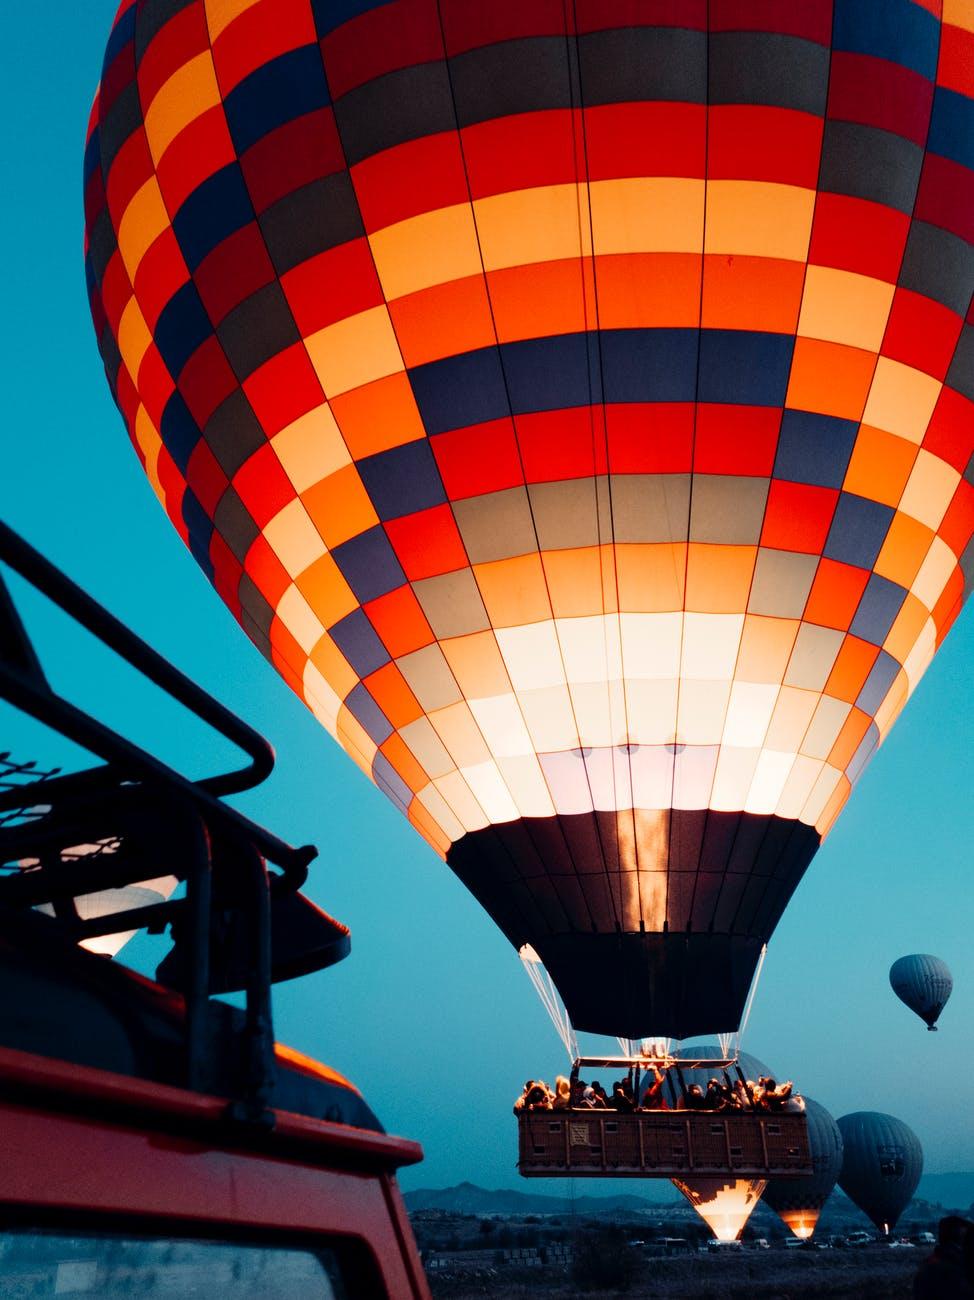 Photo by Efecan Efe on Pexels.com